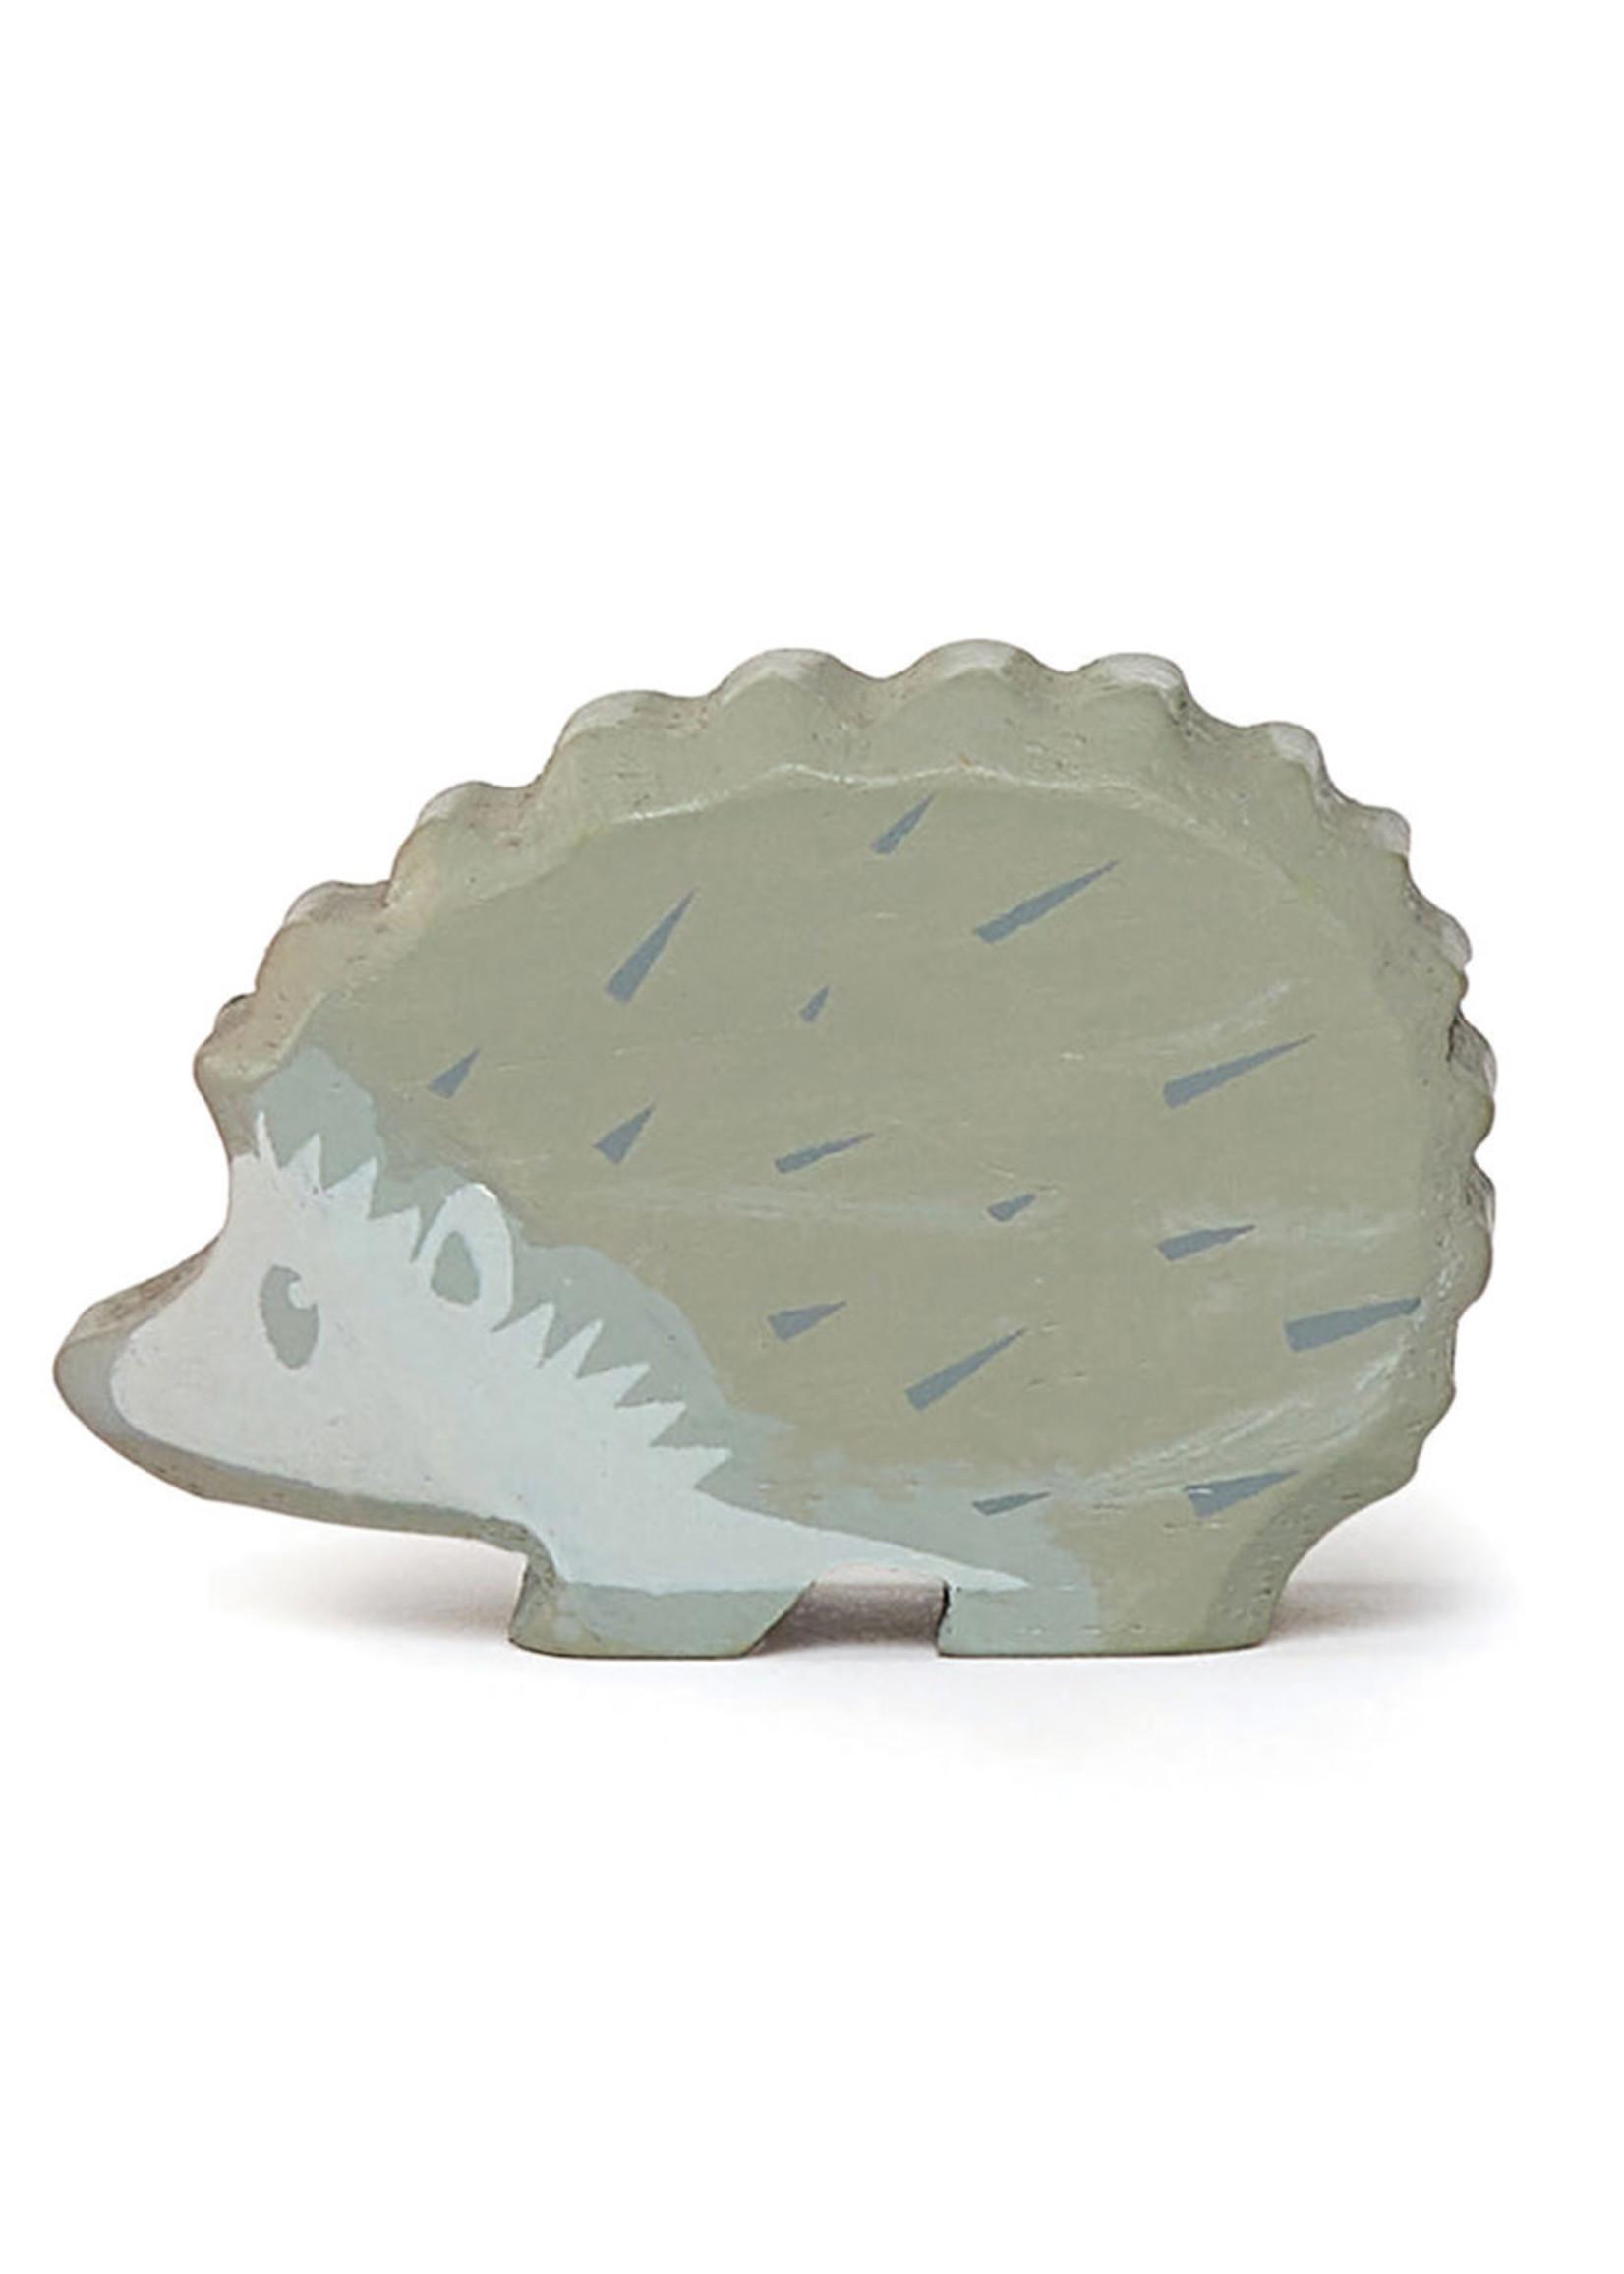 Tender Leaf Toys Woodland Animal Hedgehog